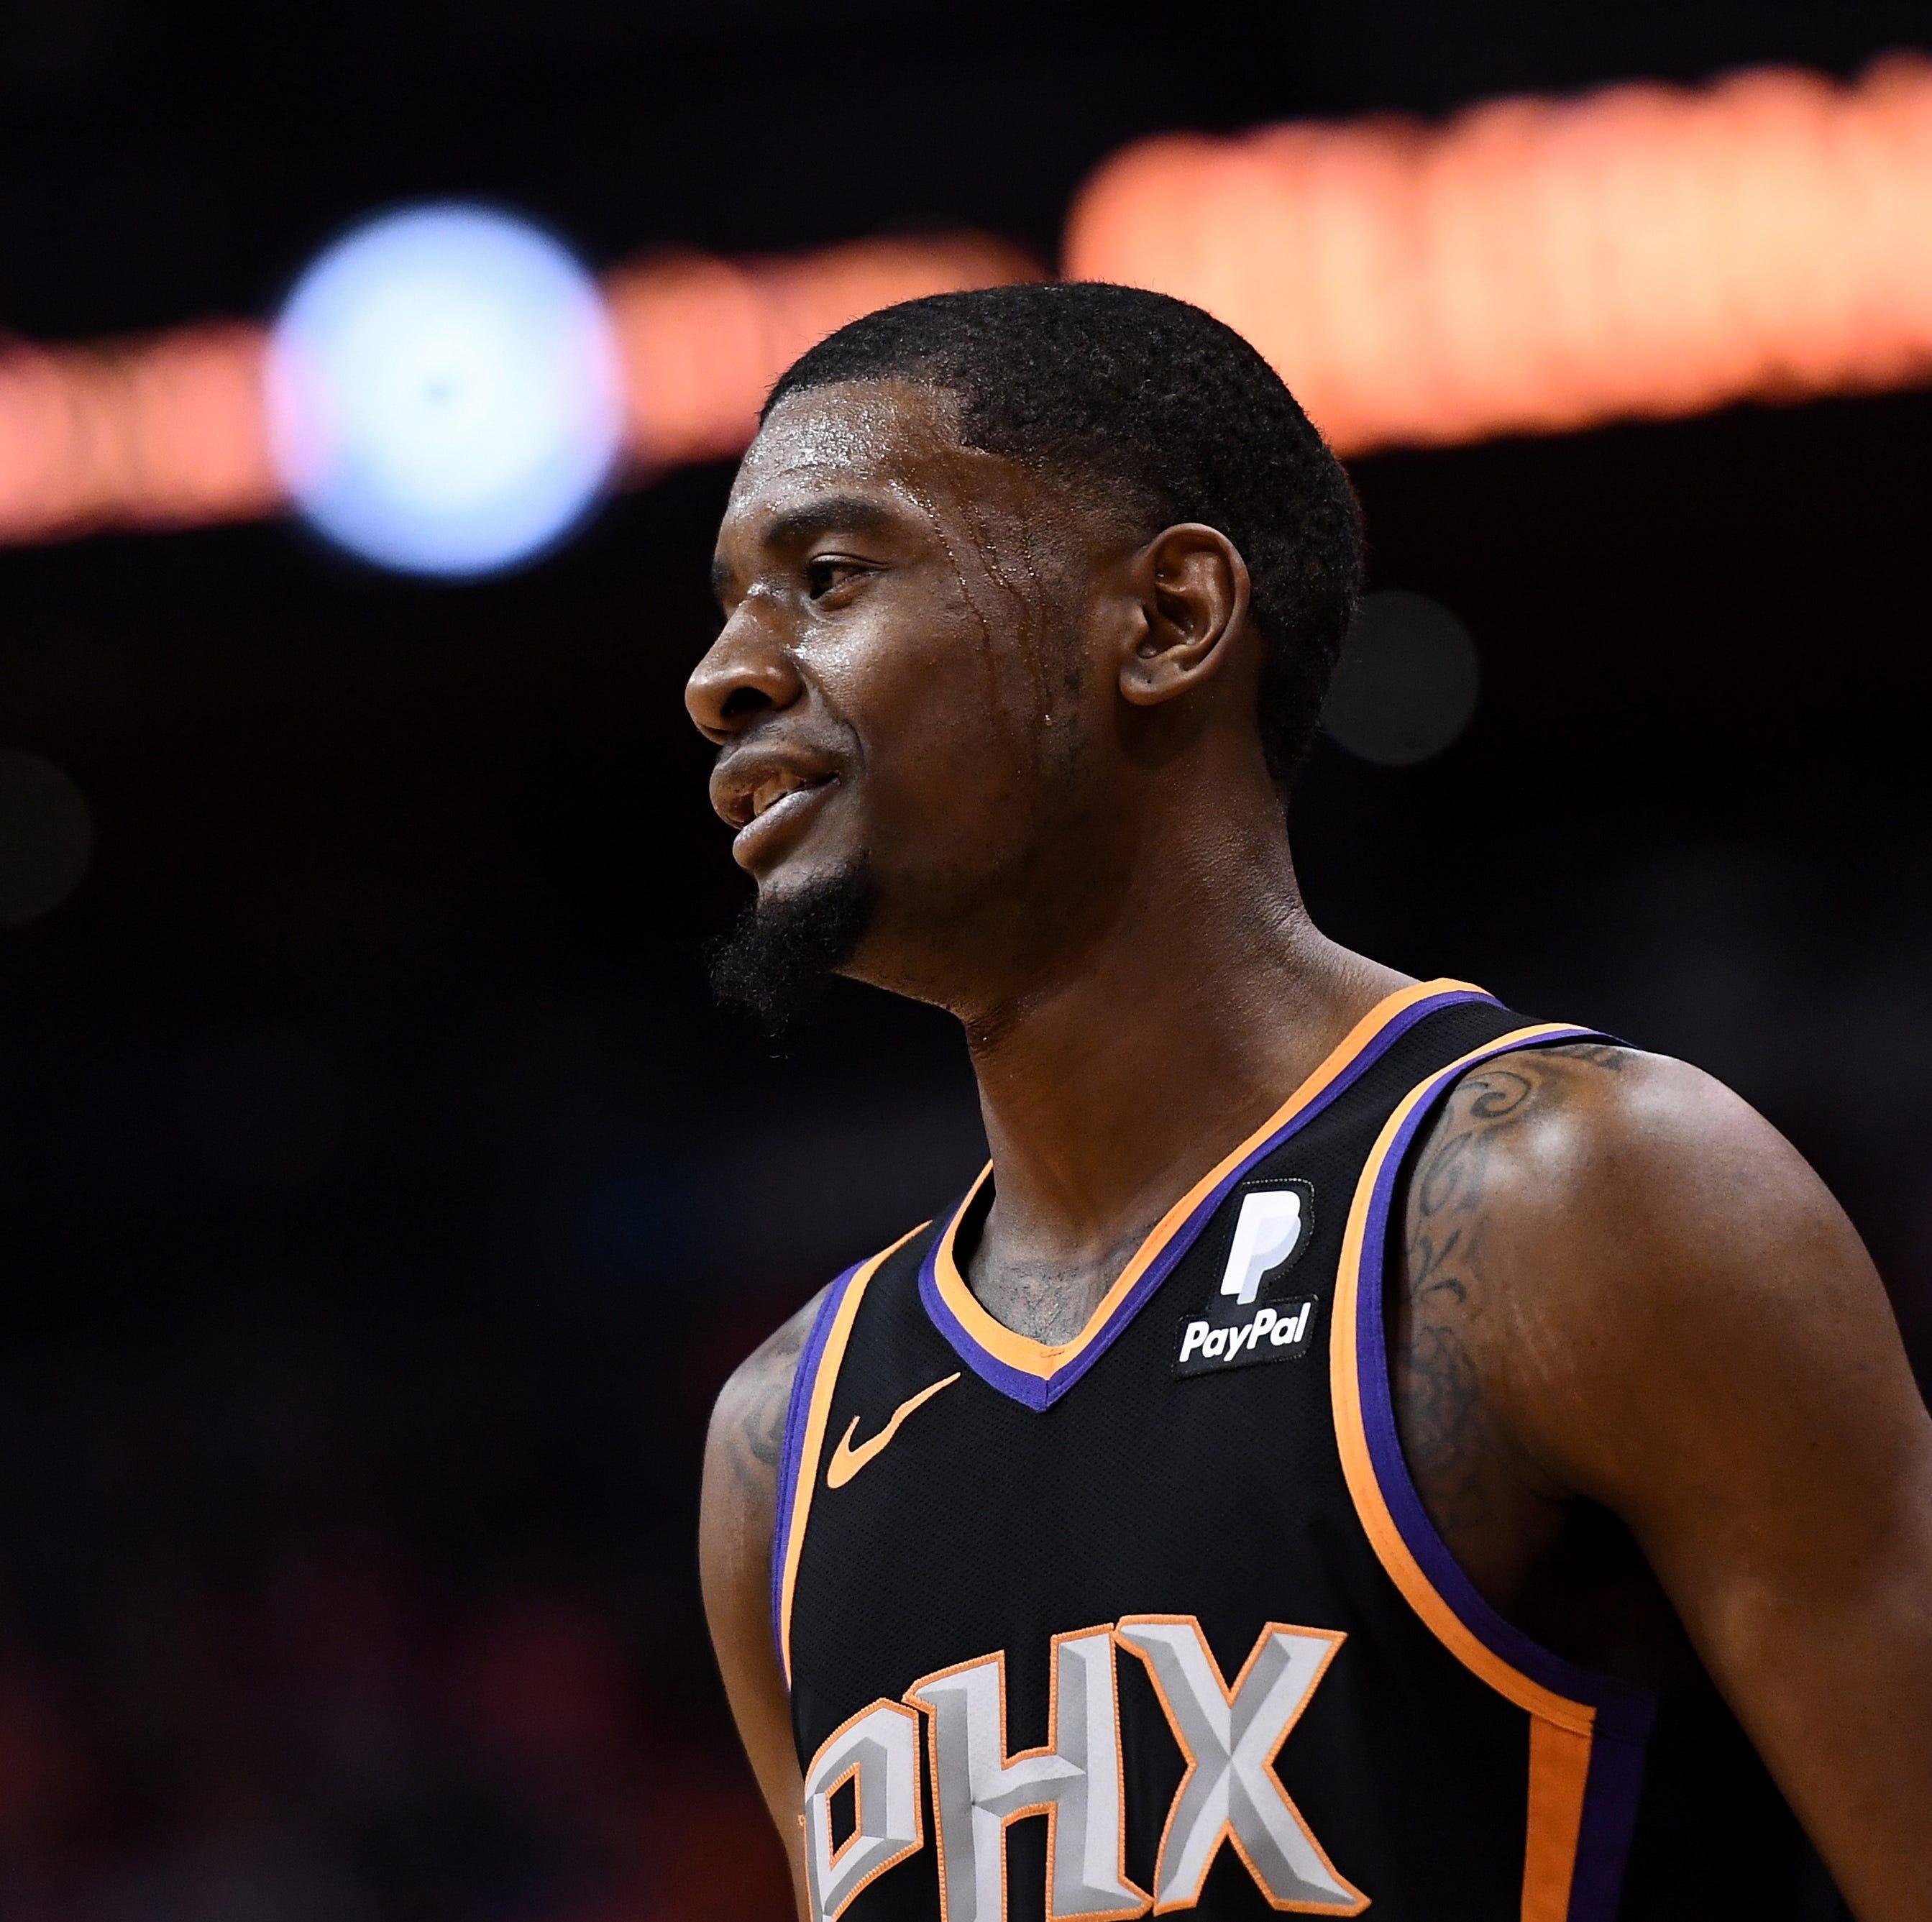 Big win aside, Suns remain under negative light after national criticisms, Jackson autograph no-show